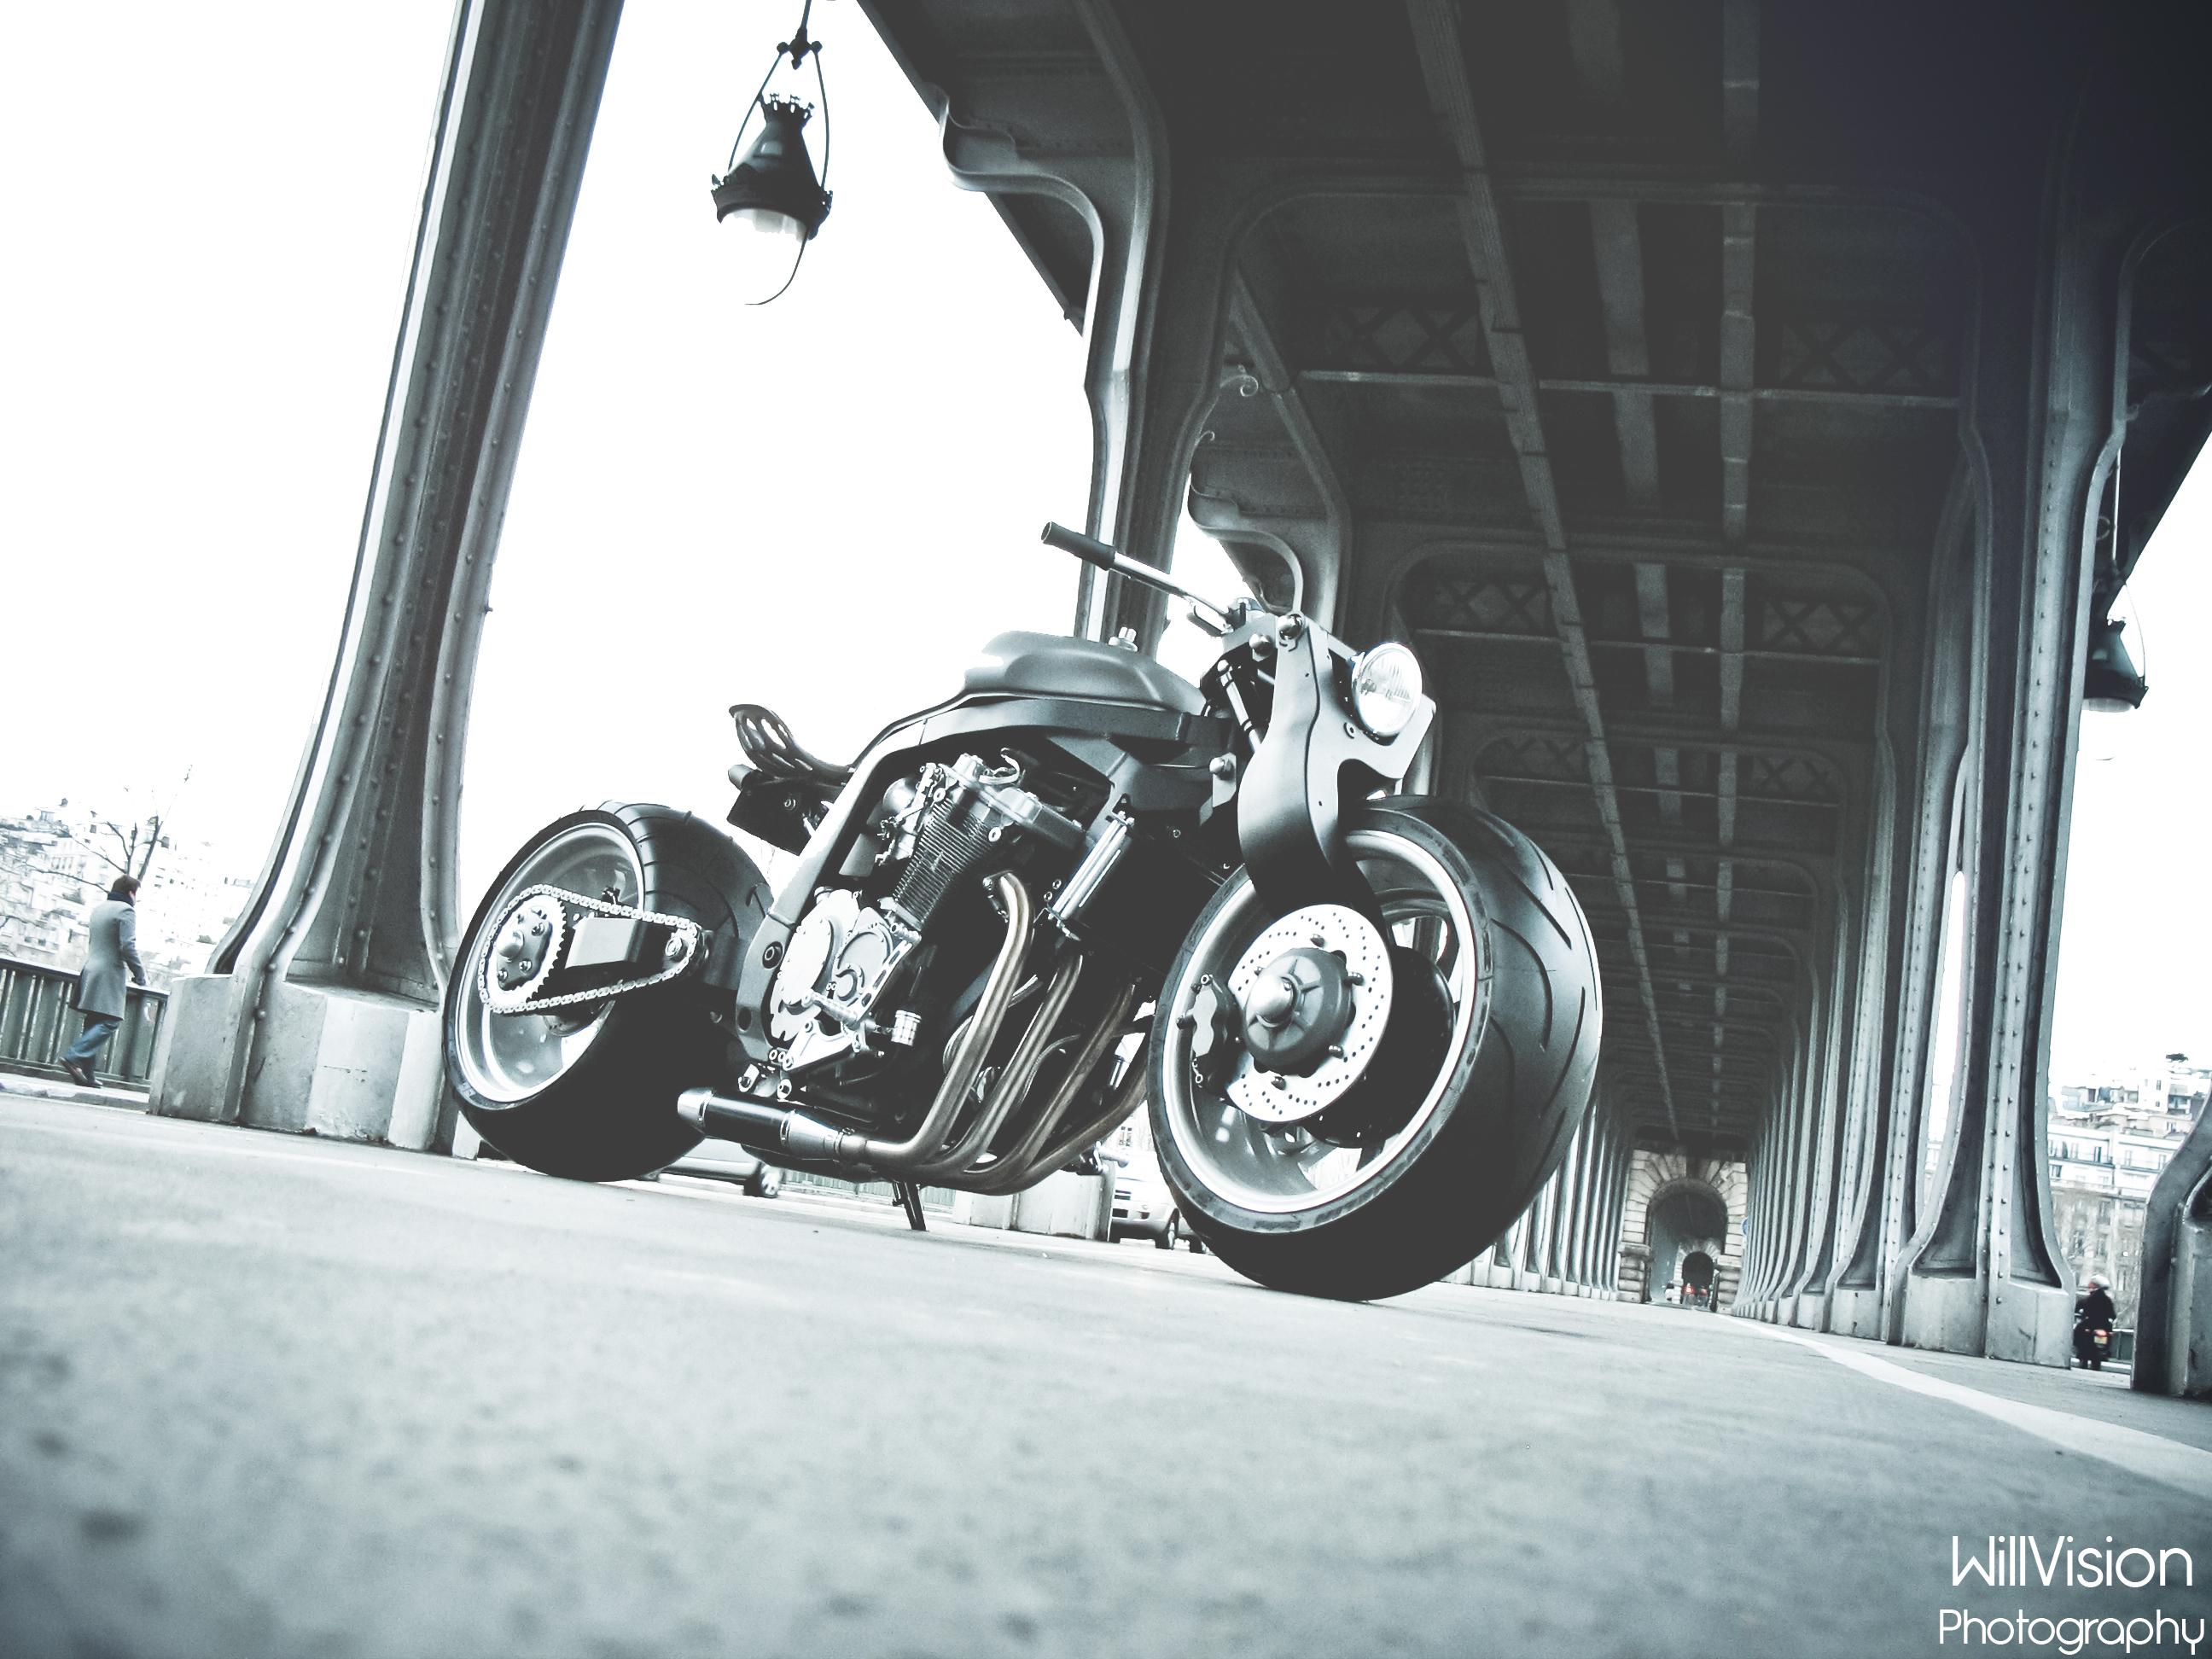 Wallpaper Street Night Car Motorcycle Canon France Bobber